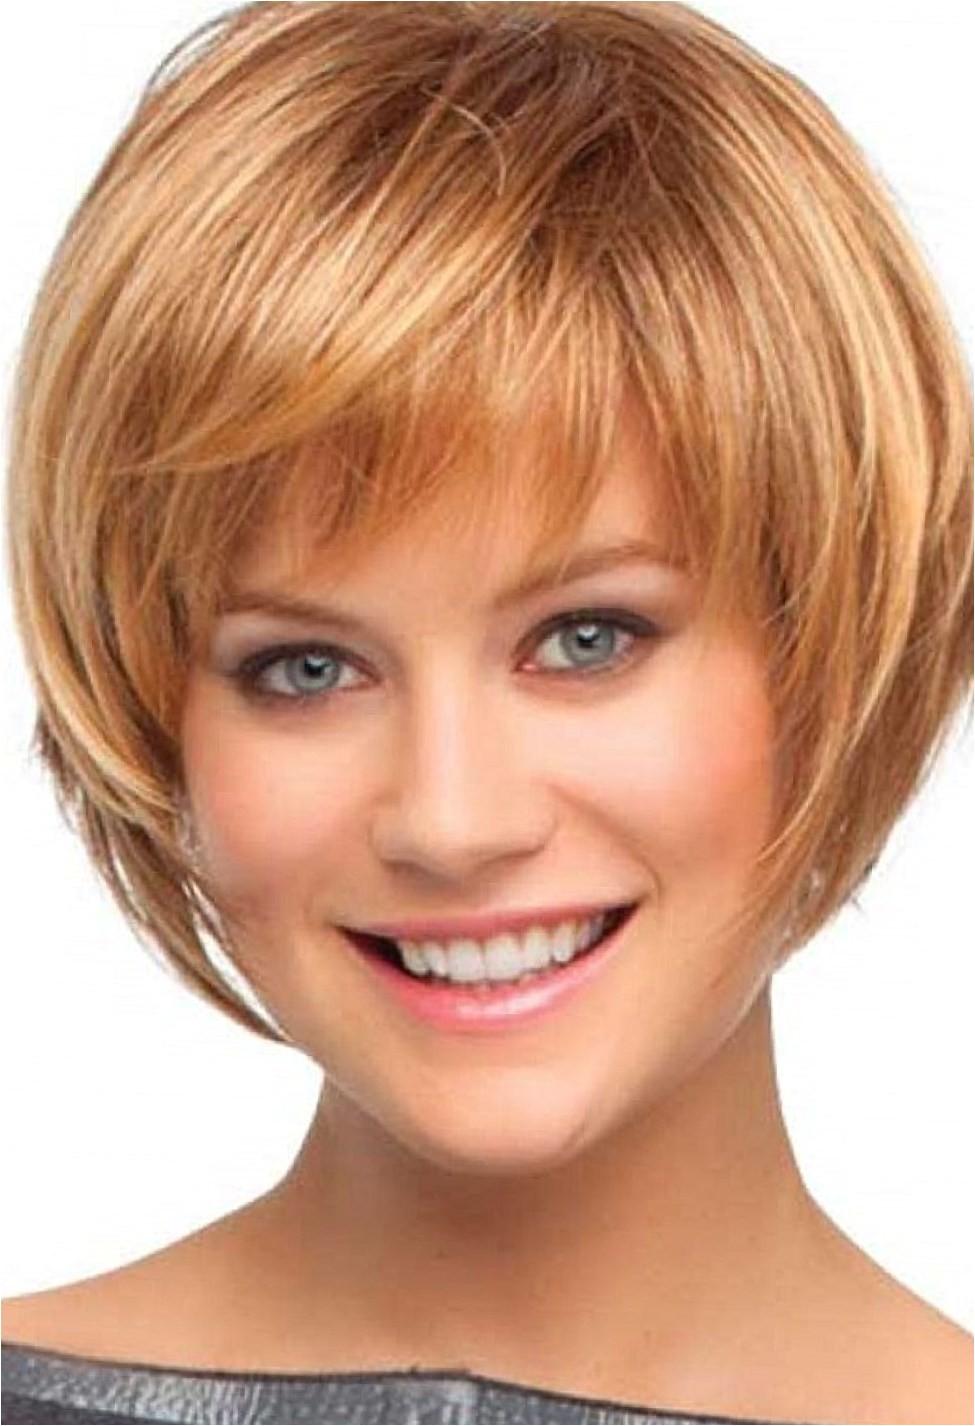 Shorter Bob Haircuts Short Bob Hairstyles with Bangs 4 Perfect Ideas for You